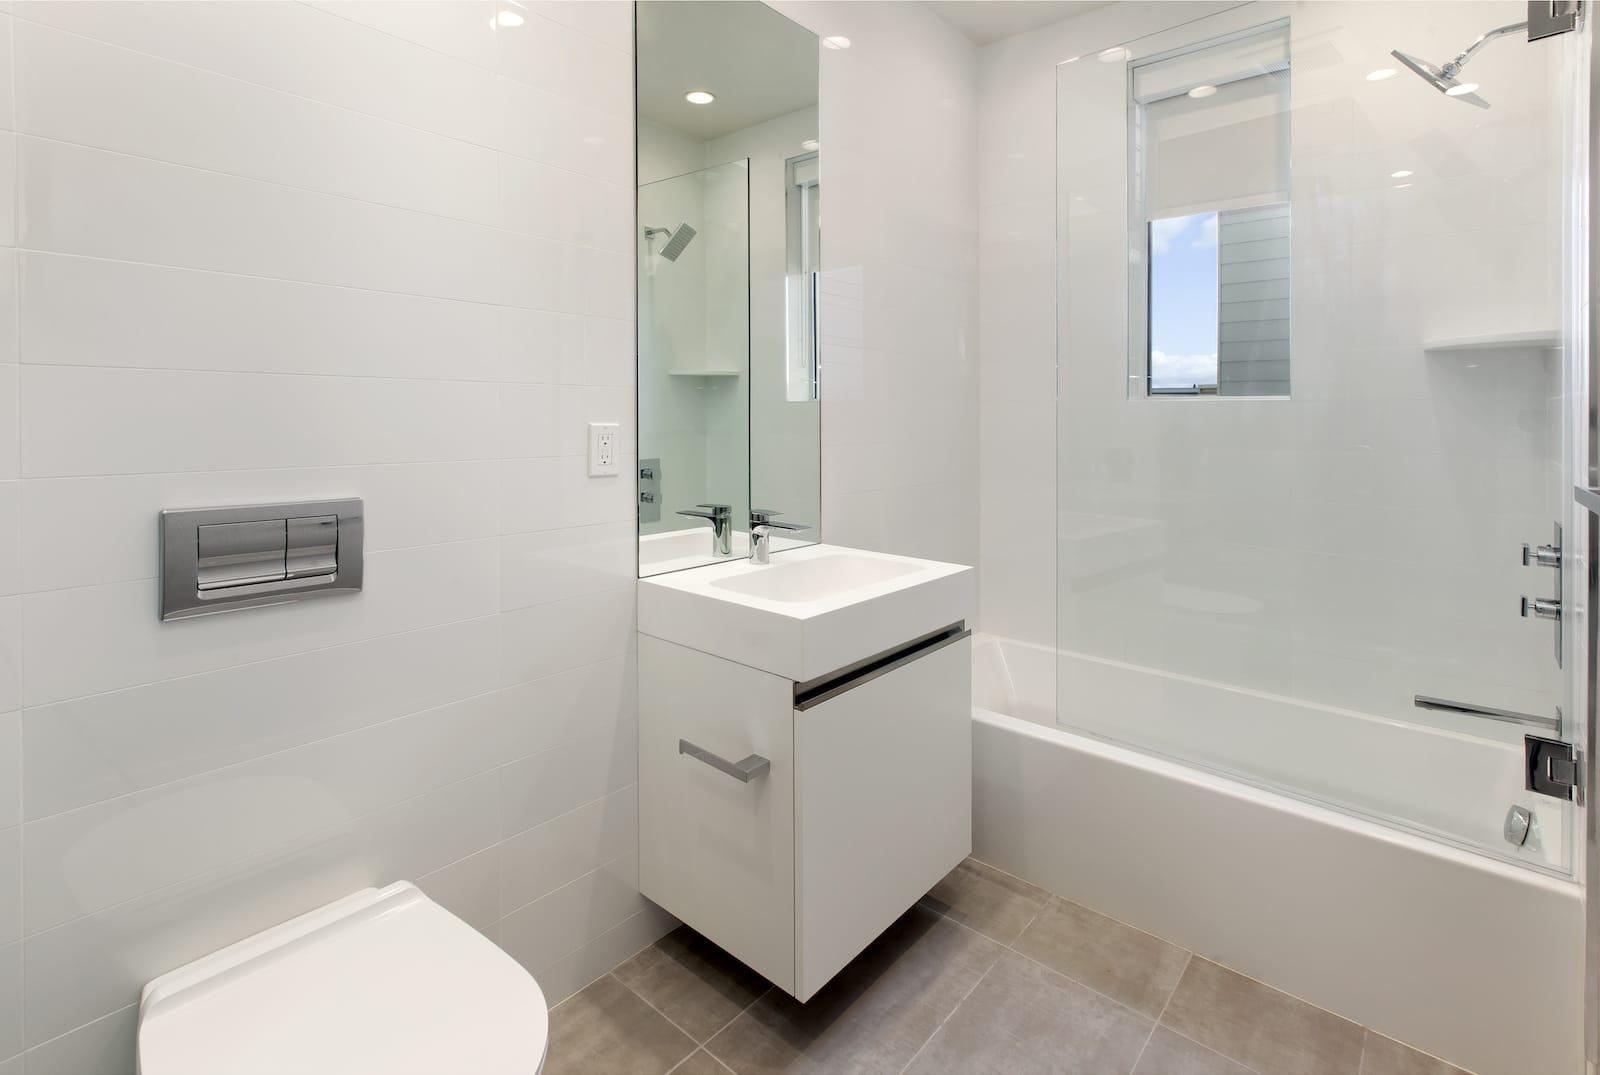 606Capp1 Bath1